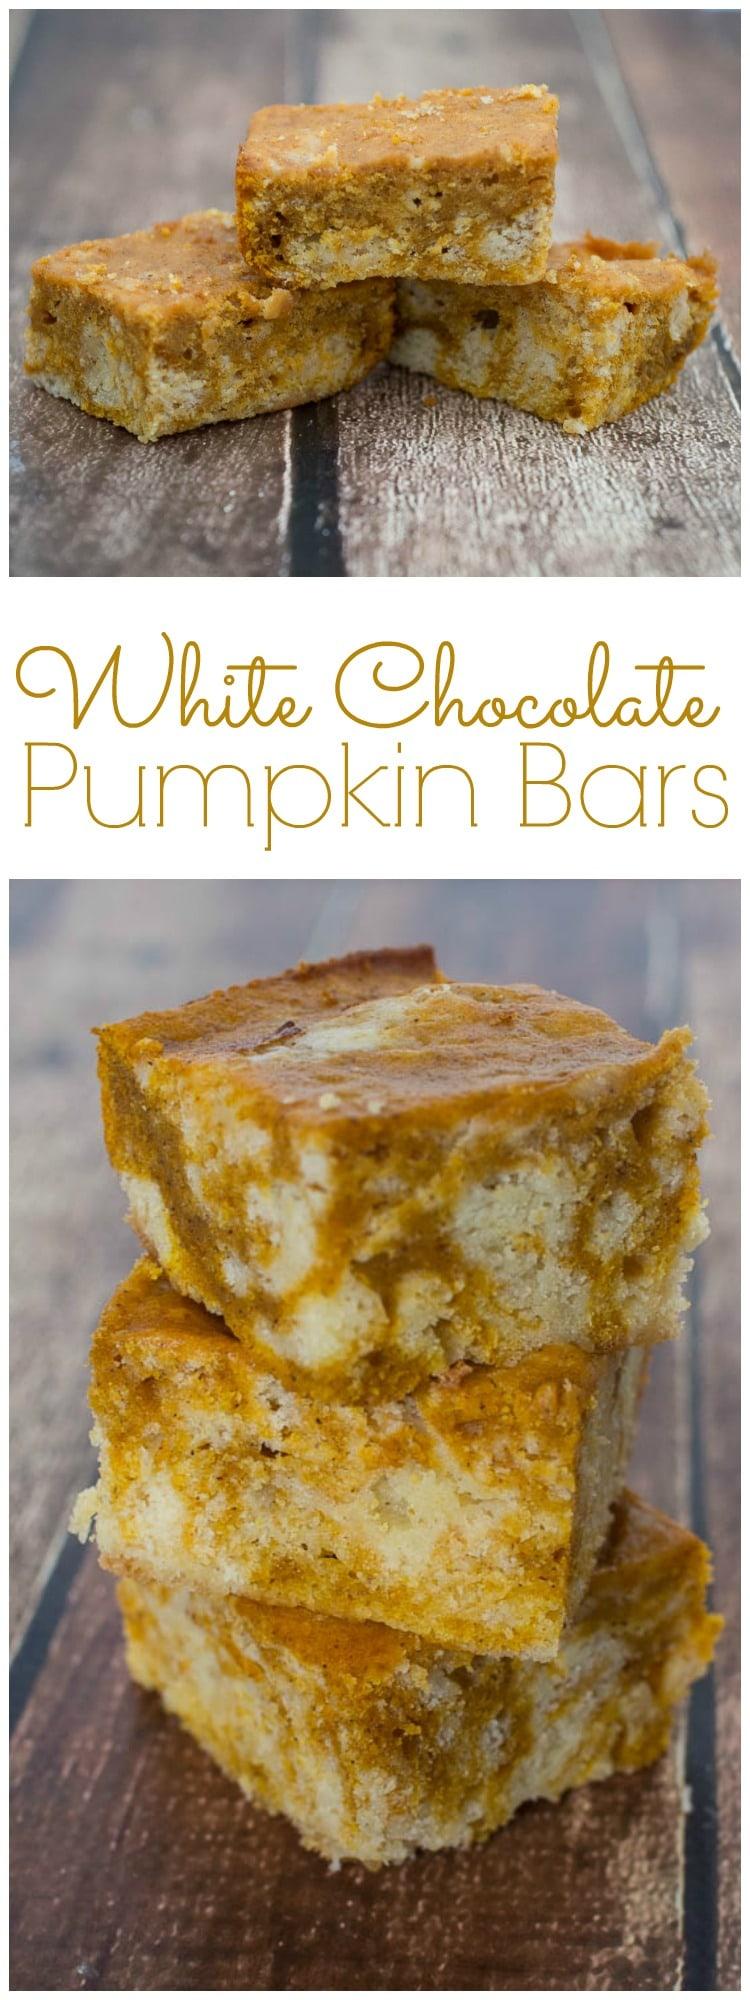 White Chocolate Pumpkin Bars | Pumpkin Treats | Easy Recipe for Pumpkin Bars | Chocolate Pumpkin Bars